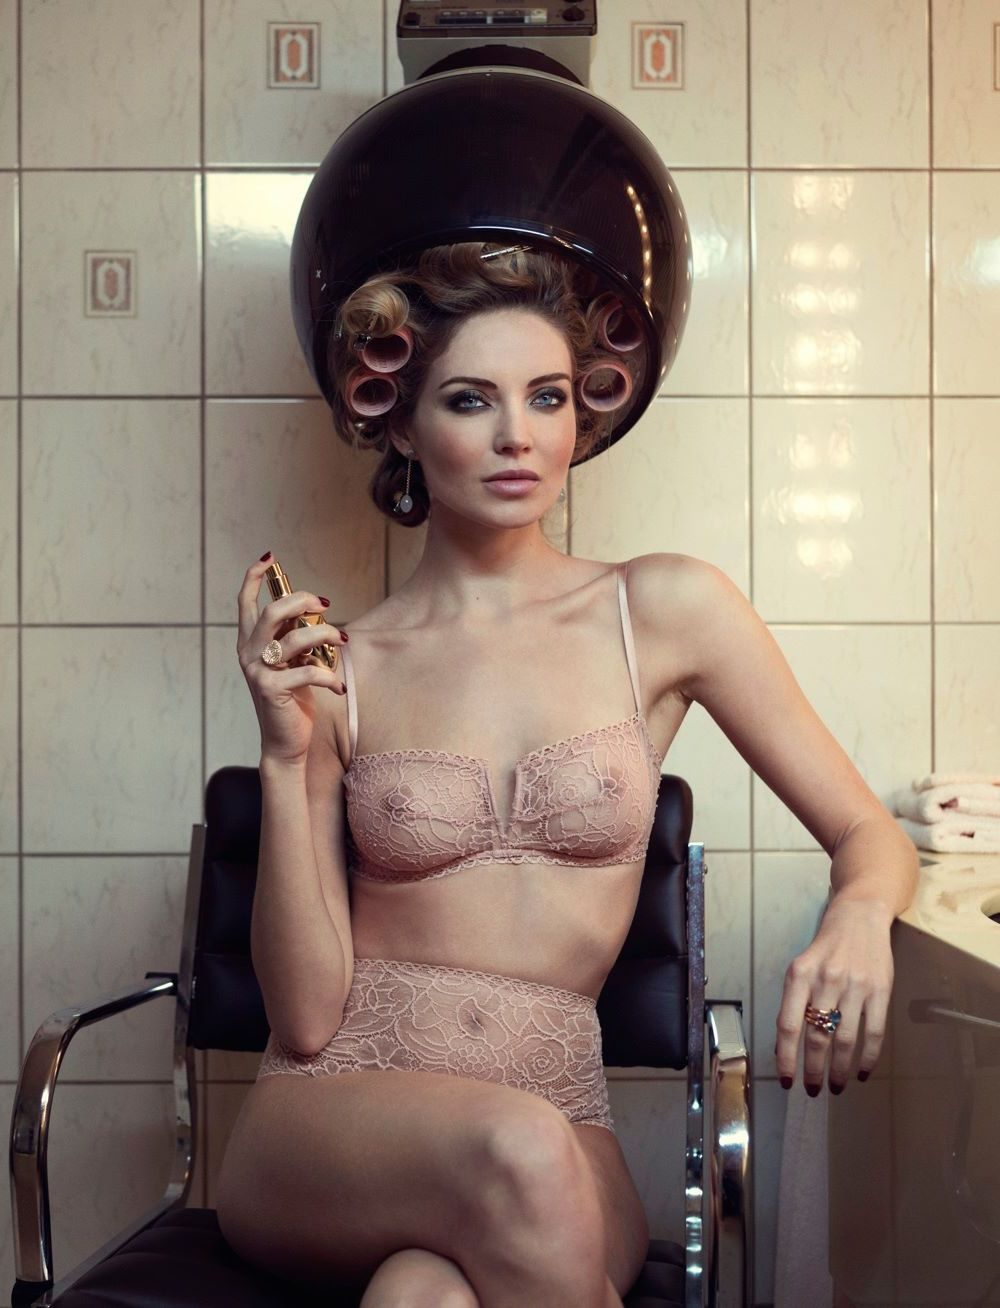 Mélissa Gateau Fashion Model Sexy Lingerie in Eres Campaign 2015 Photoshoots b8c3f4deb